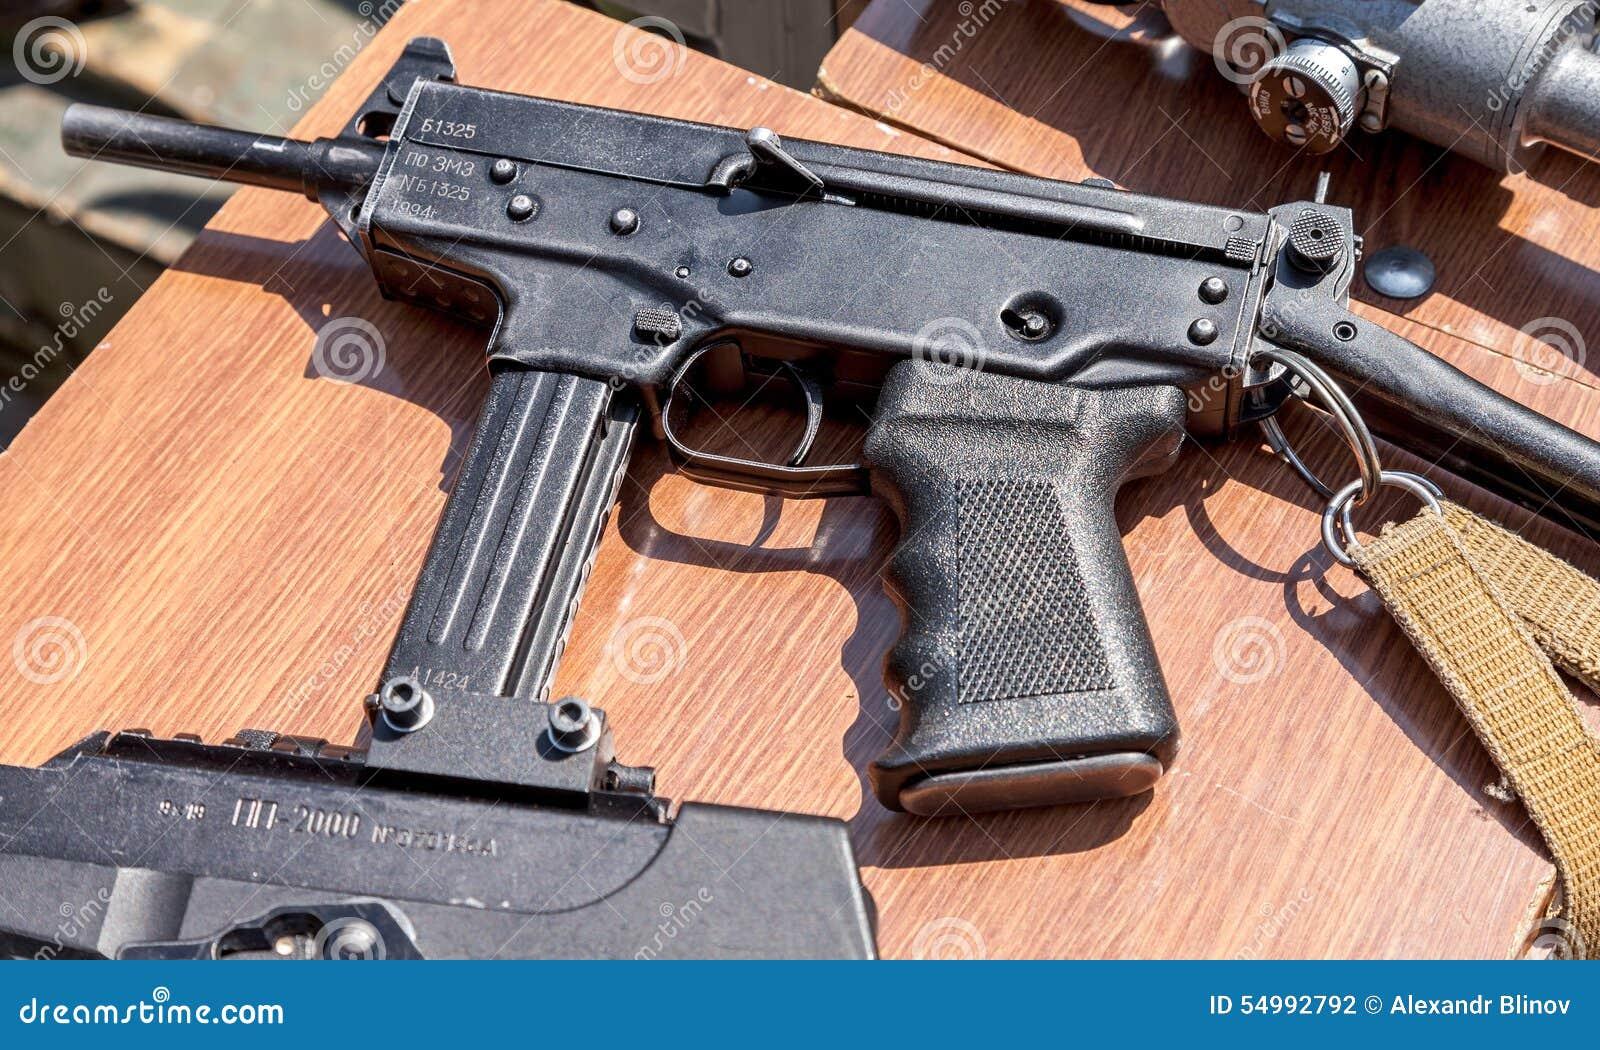 Alexandr pistoletov from russia to ukraine 5